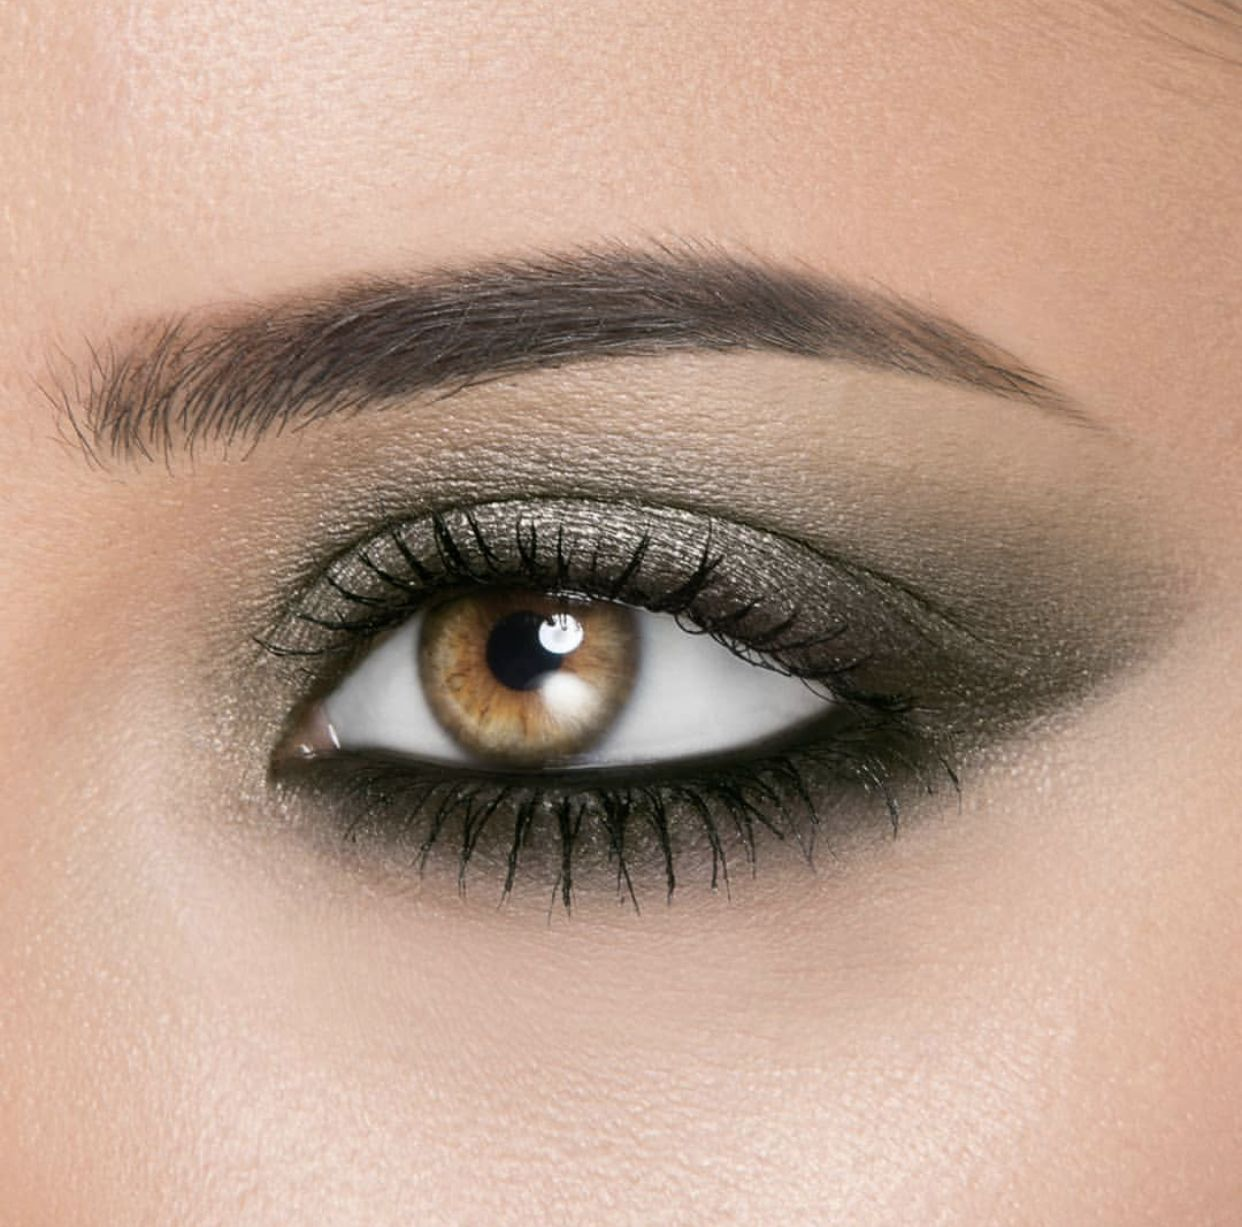 Pin By Deanna Pavlov On Tattoos: #eyeshadow #eyeshadowtutorial #eyeshadowswatches